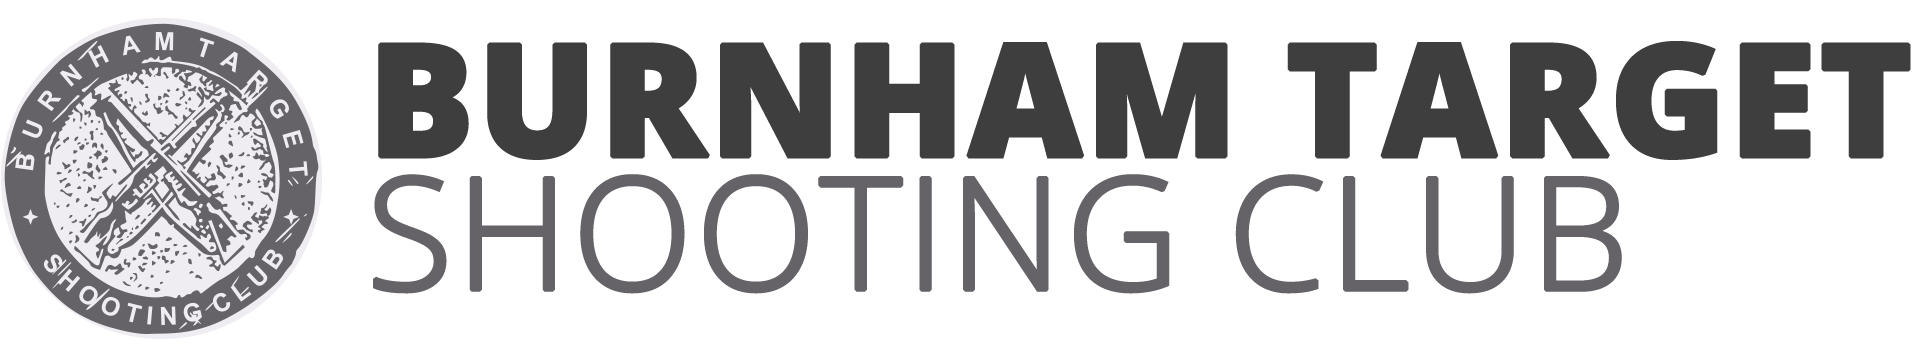 Burnham Target Shooting Club